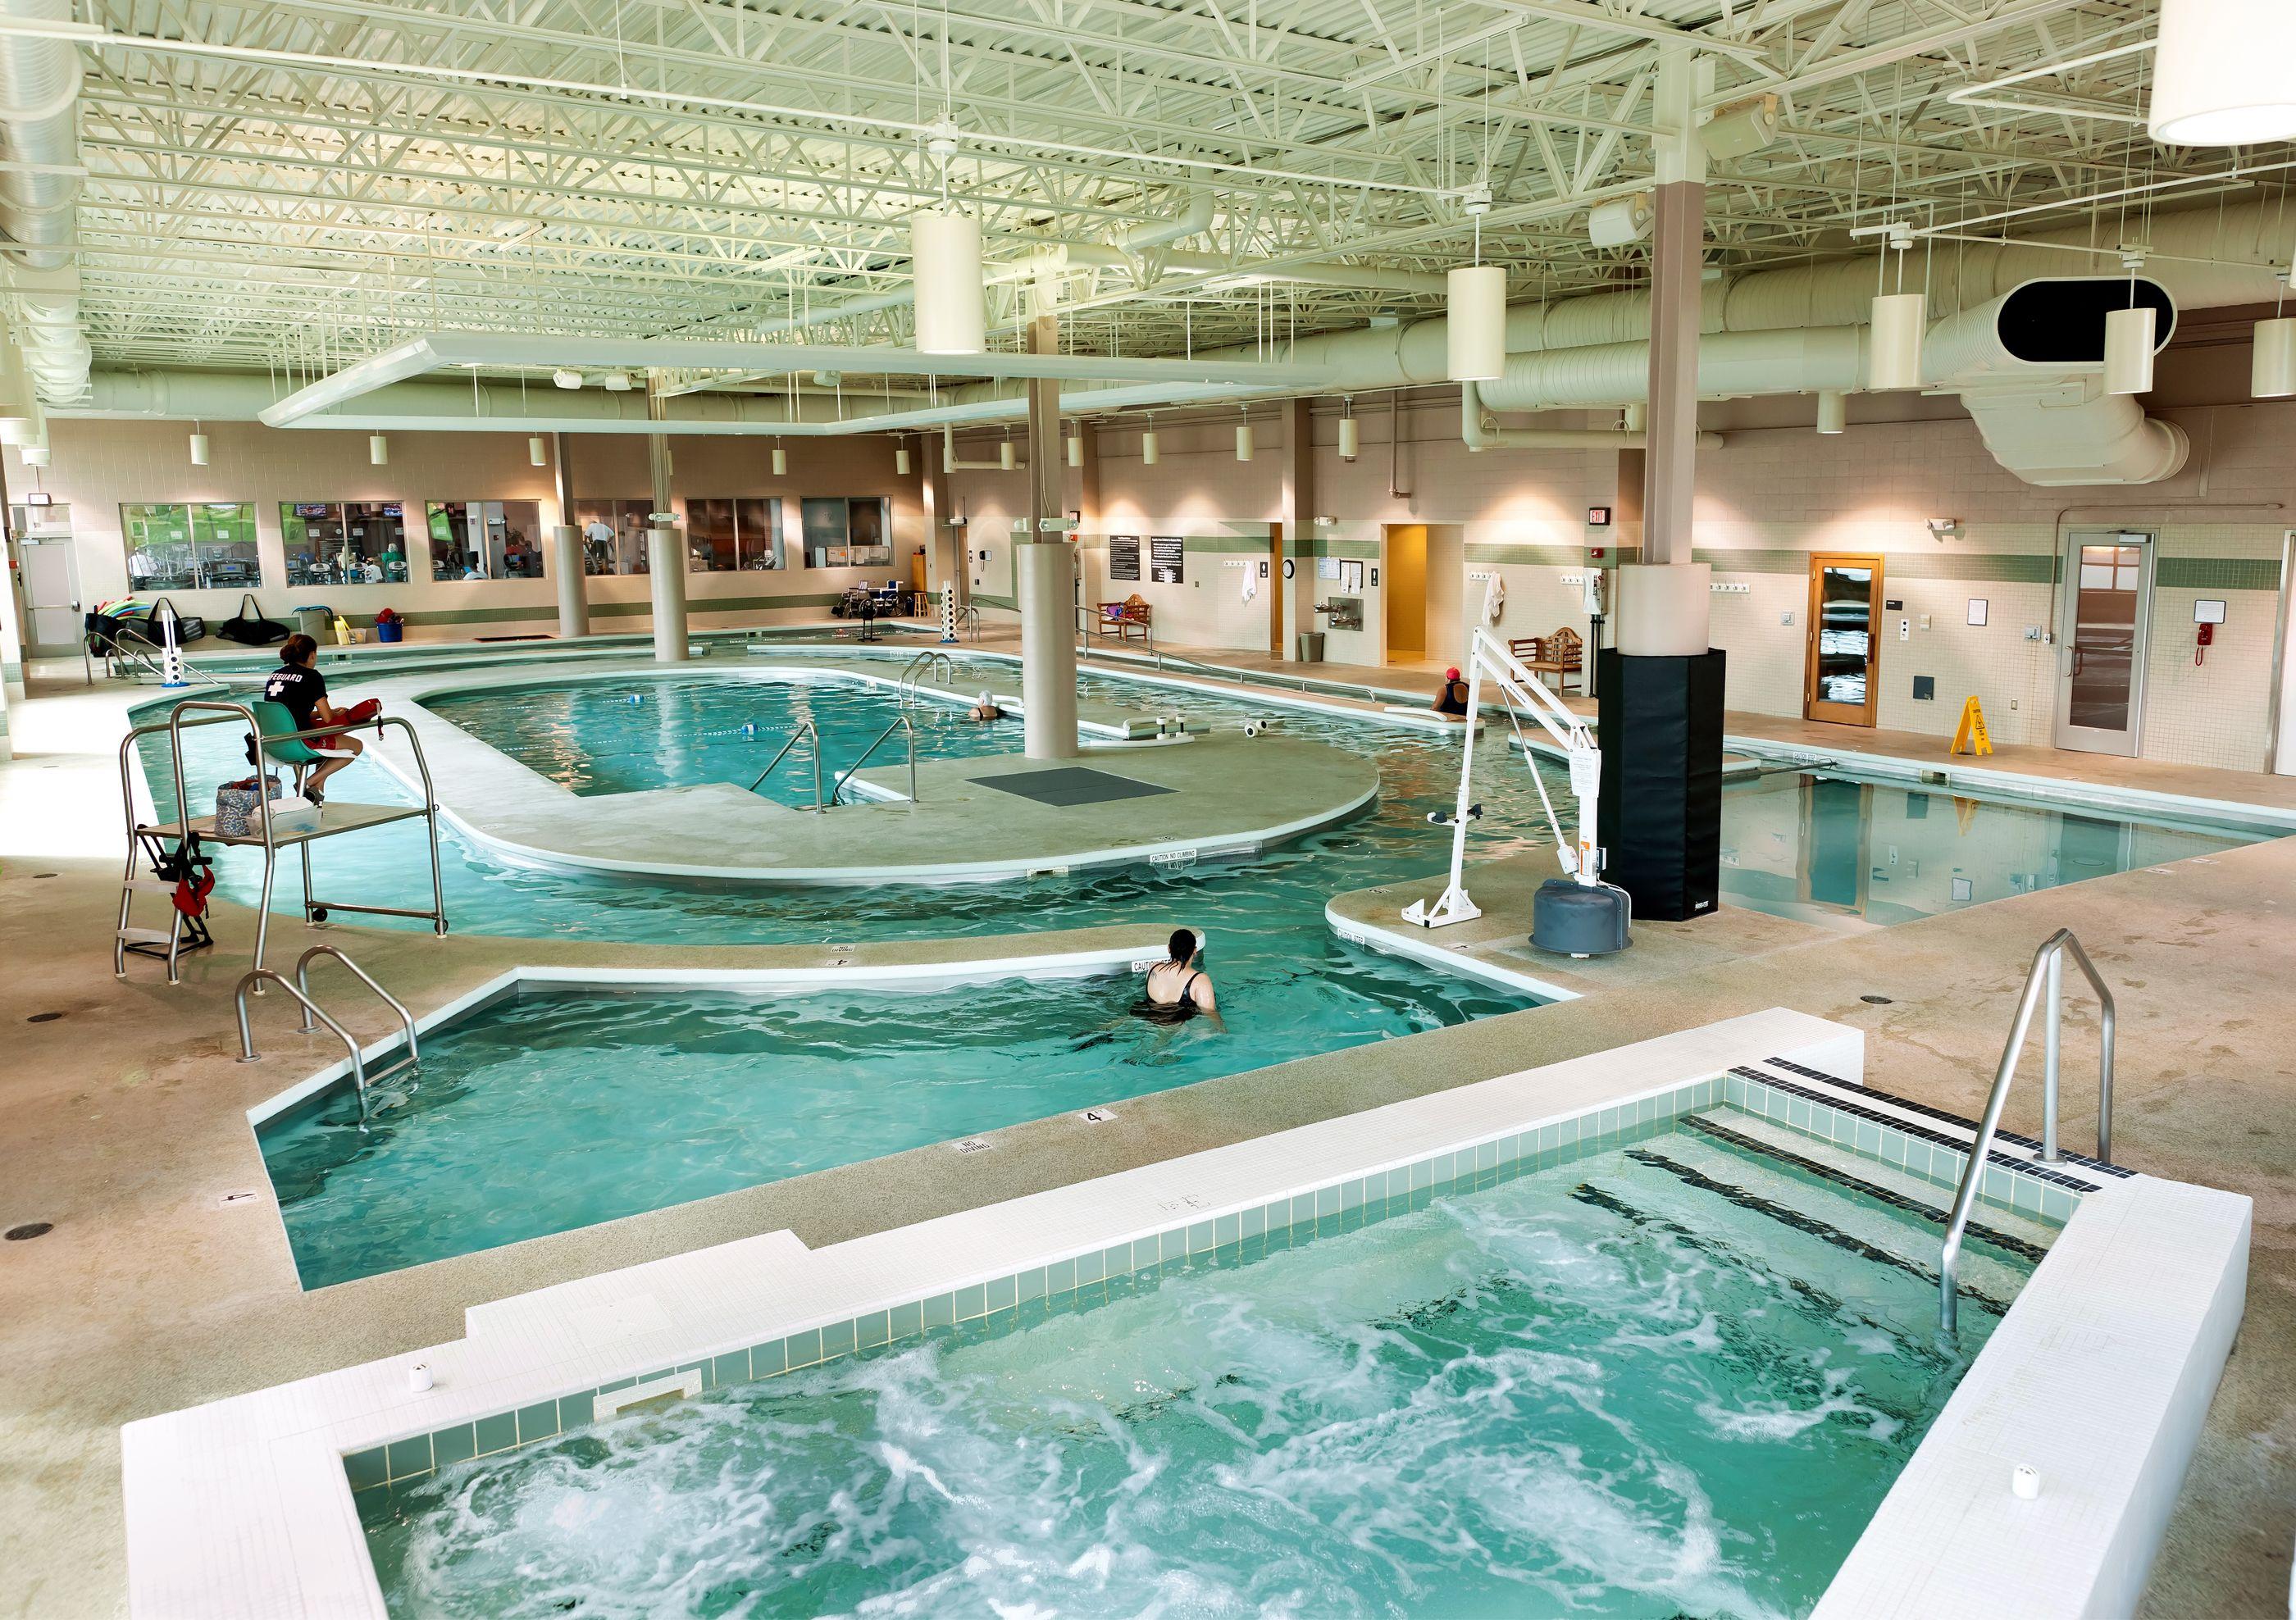 Culpeper regional health systems powell wellness center